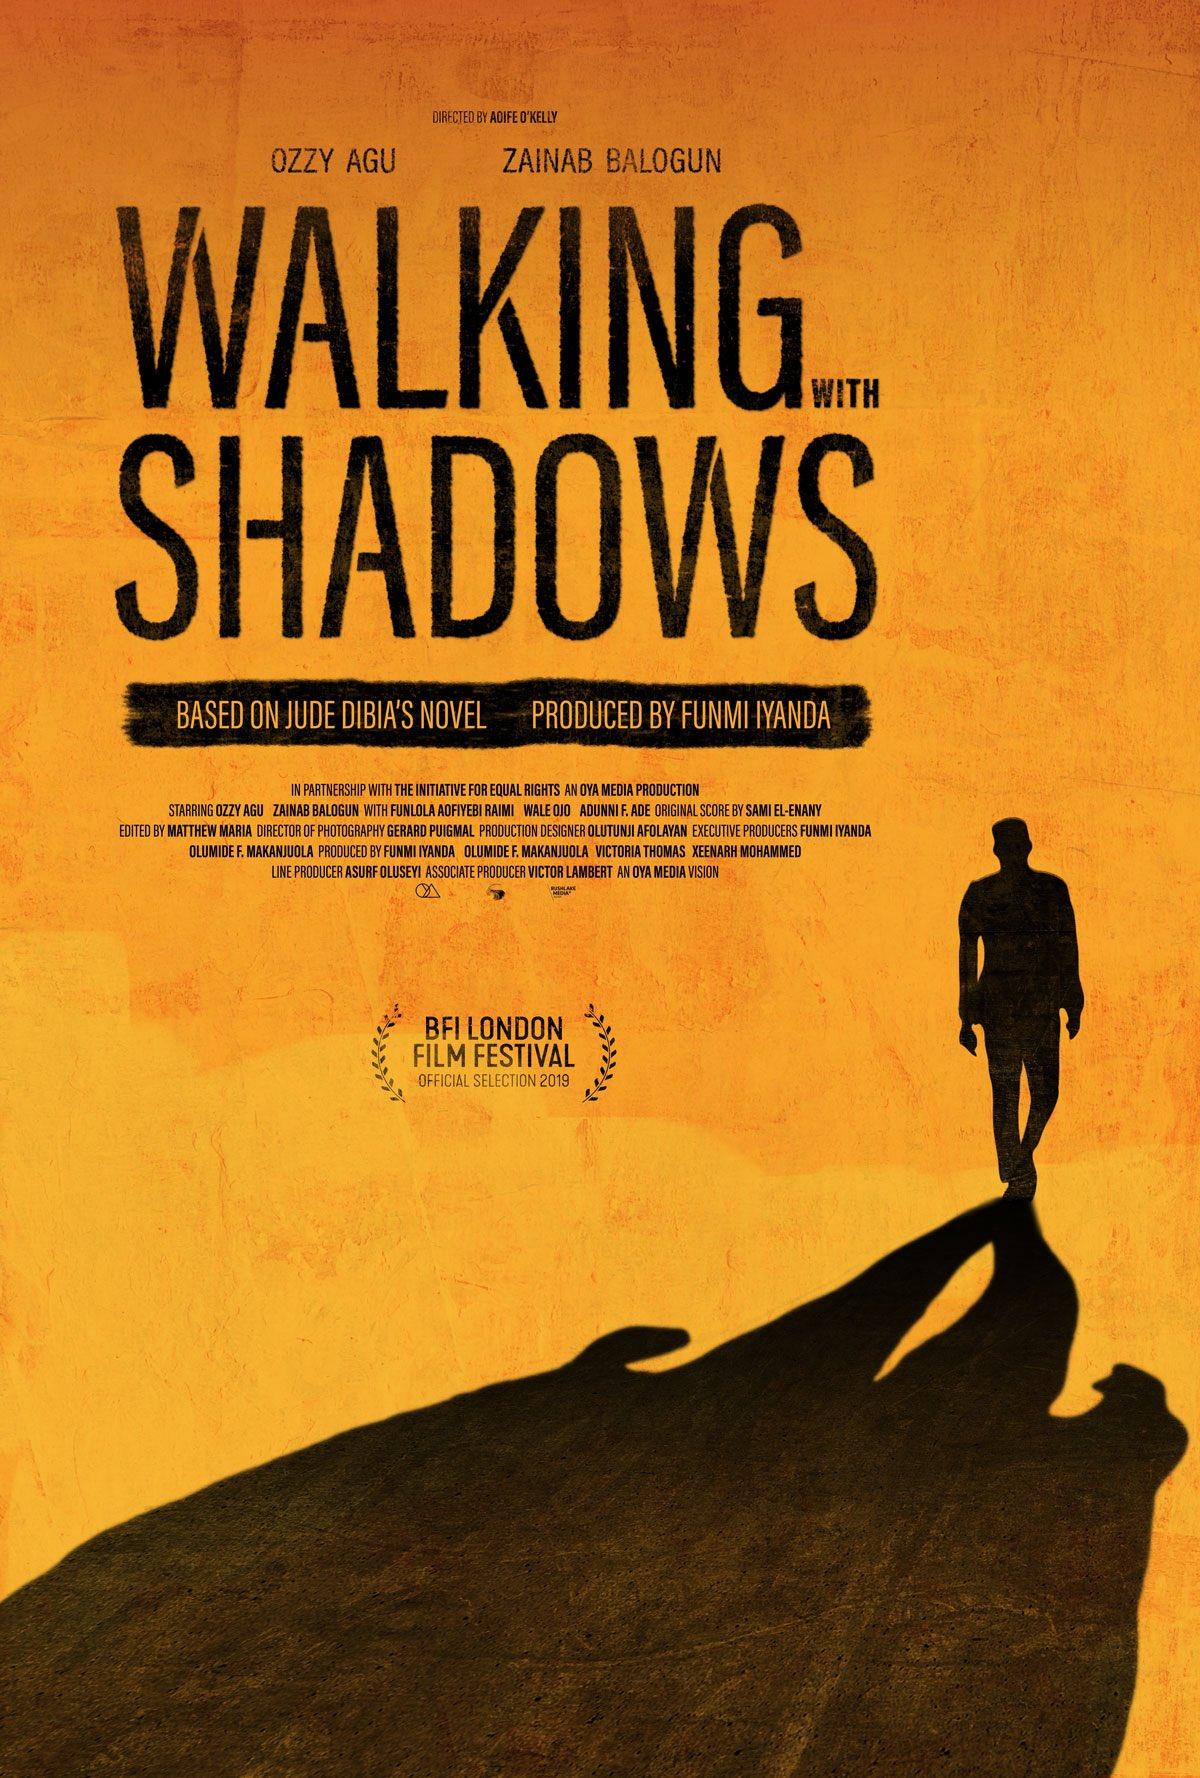 Funmi Iyanda's Debut Movie 'Walking with Shadows' Premieres at BFI London Film Festival